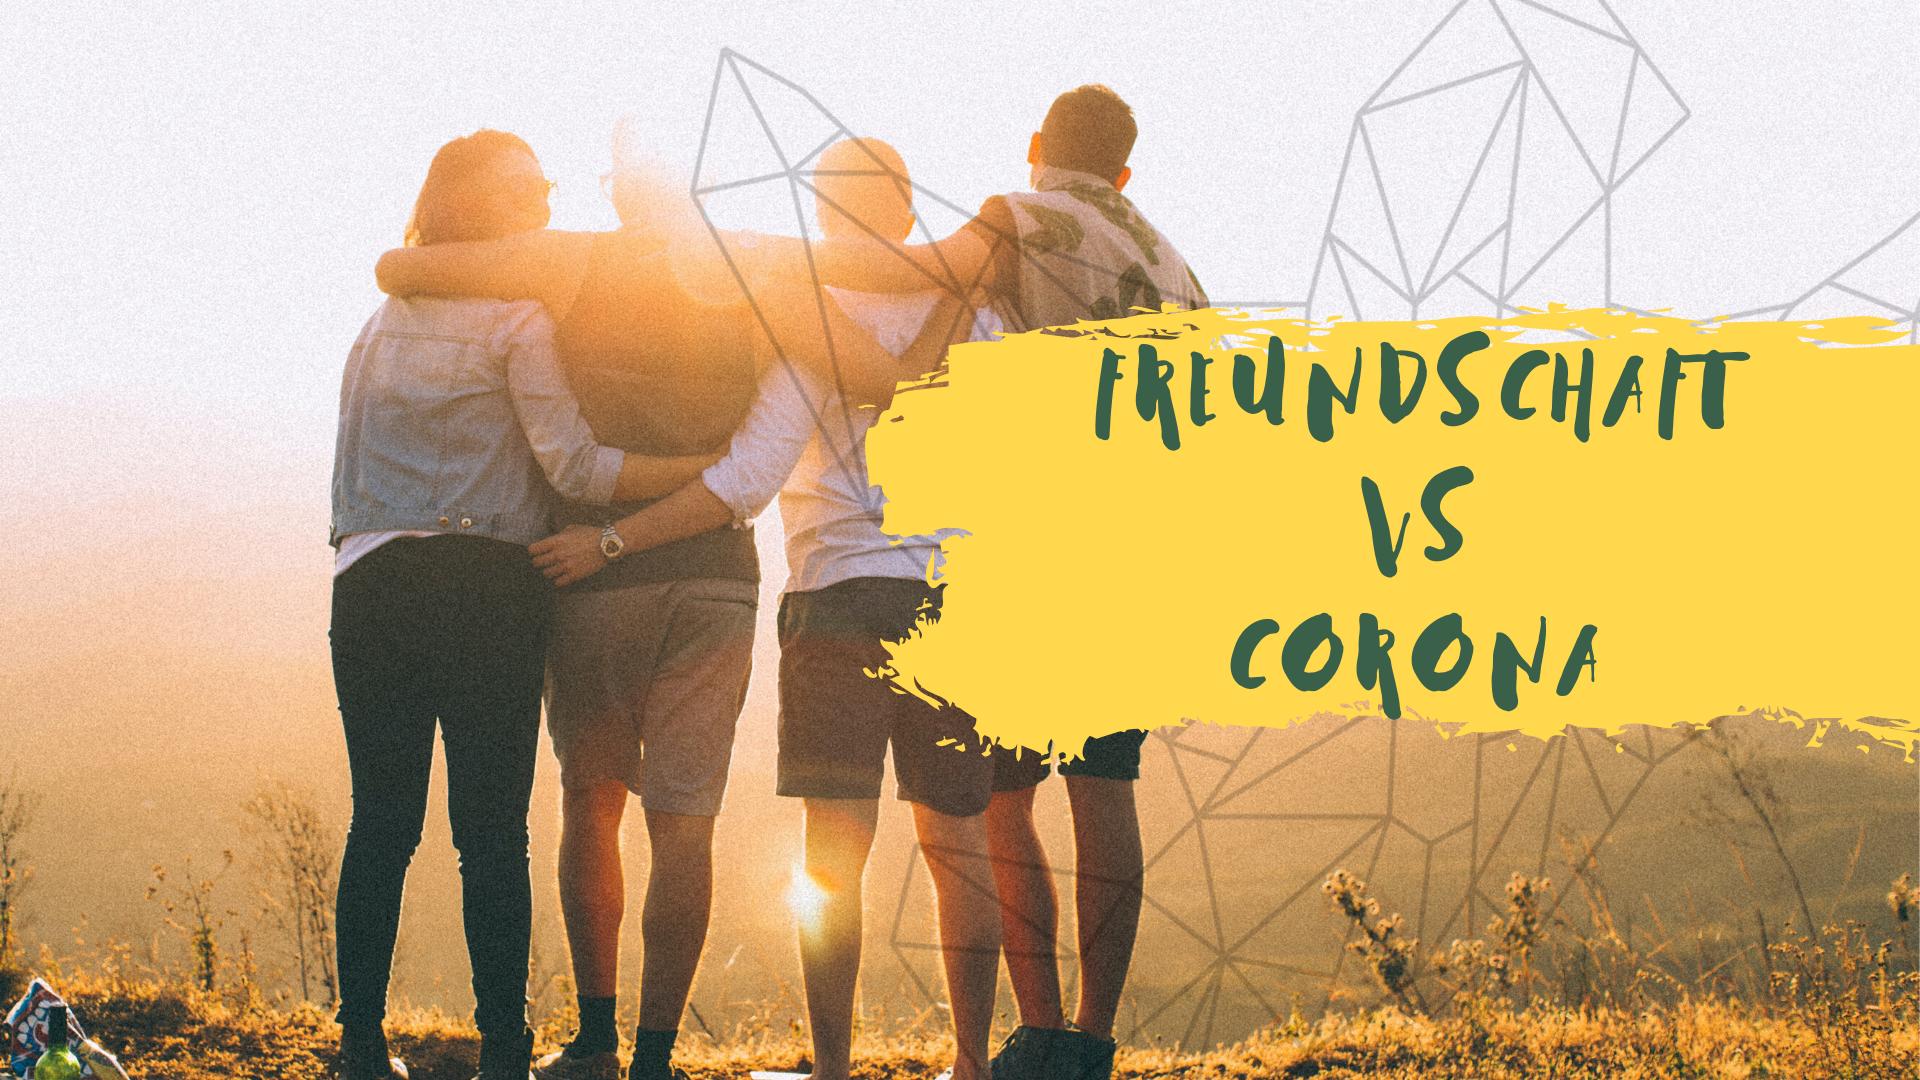 Freundschaft vs. Corona